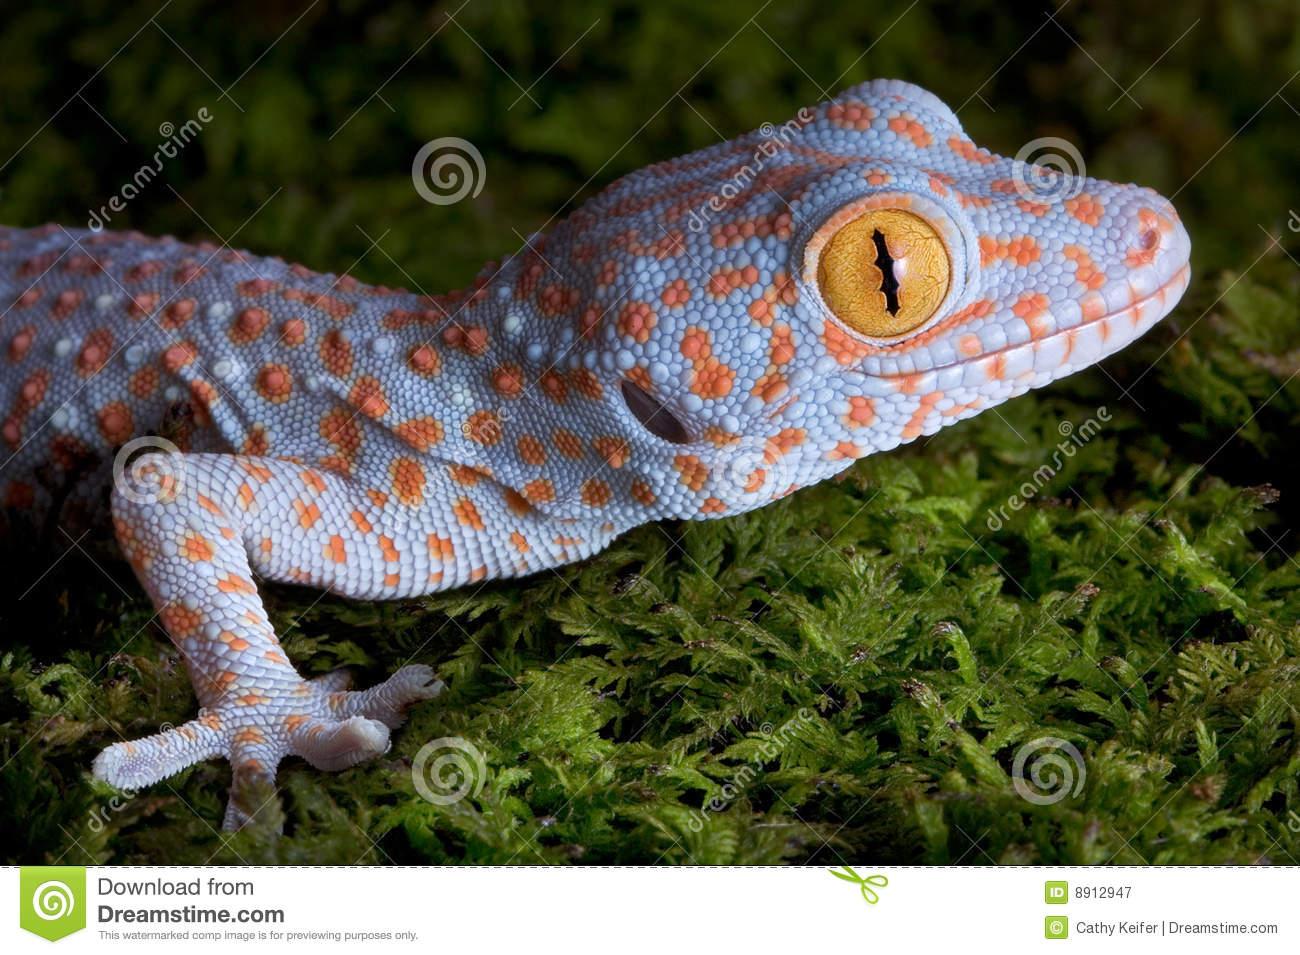 Tokay Gecko clipart #9, Download drawings